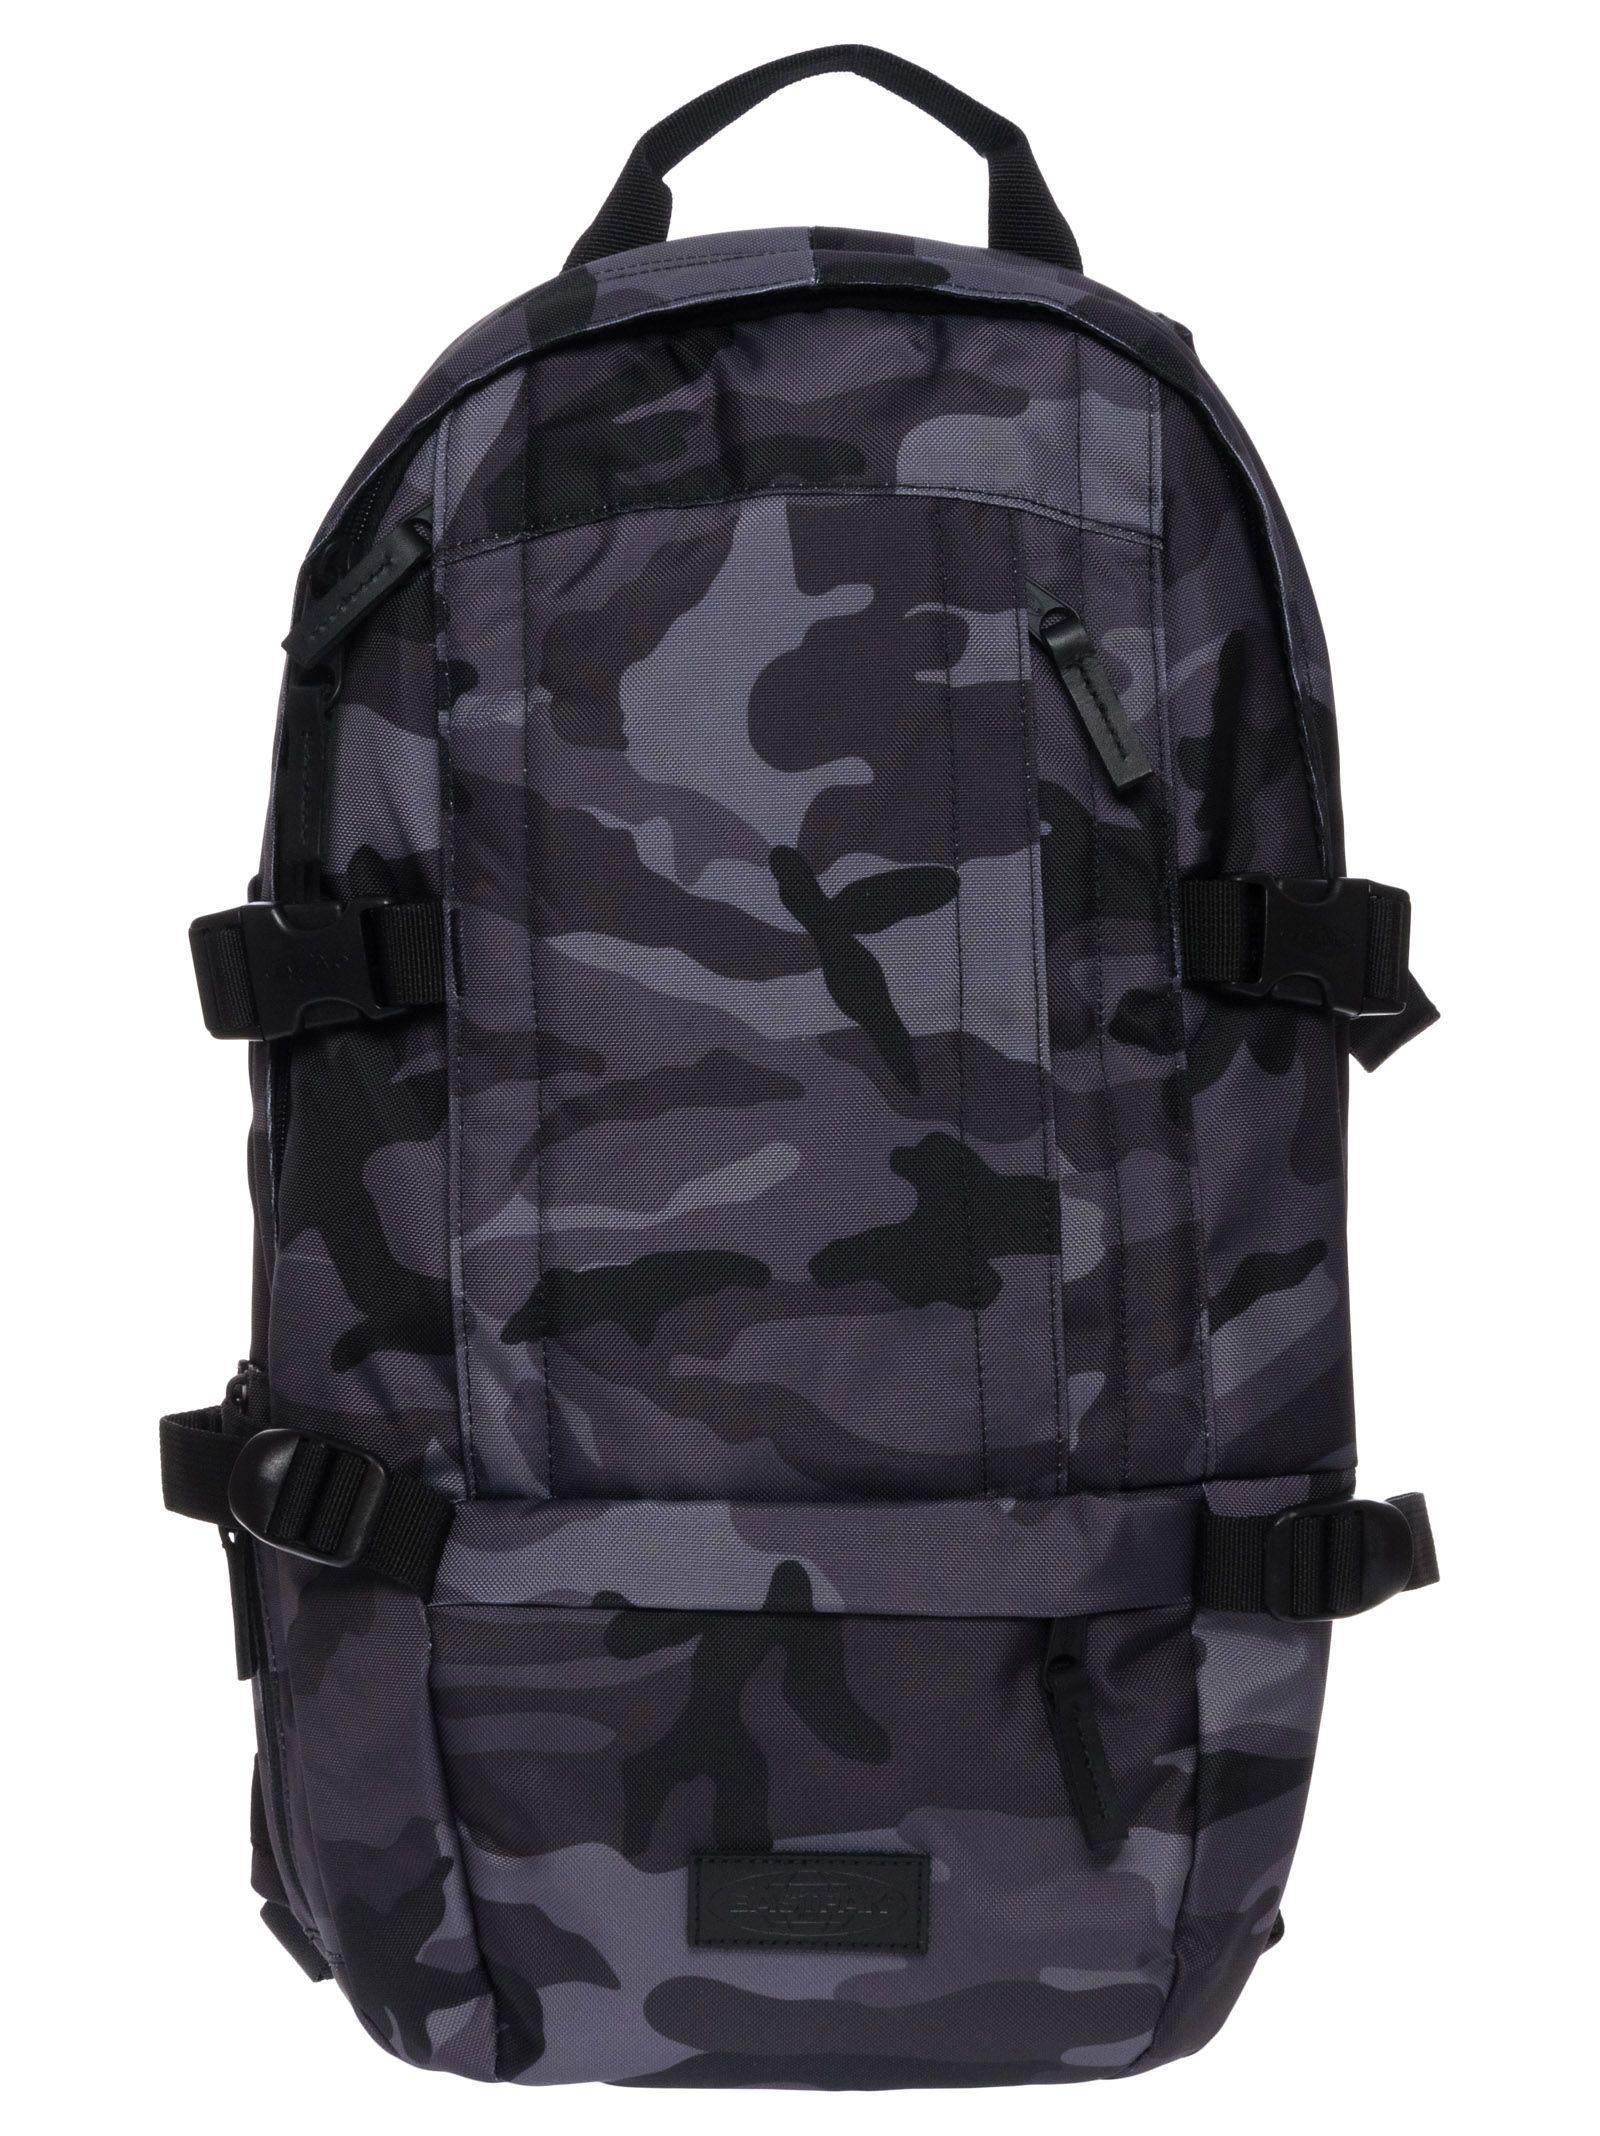 dd01cb80a04 Eastpak Eastpak Floid Backpack - Constructed-camo - 10826397 | italist